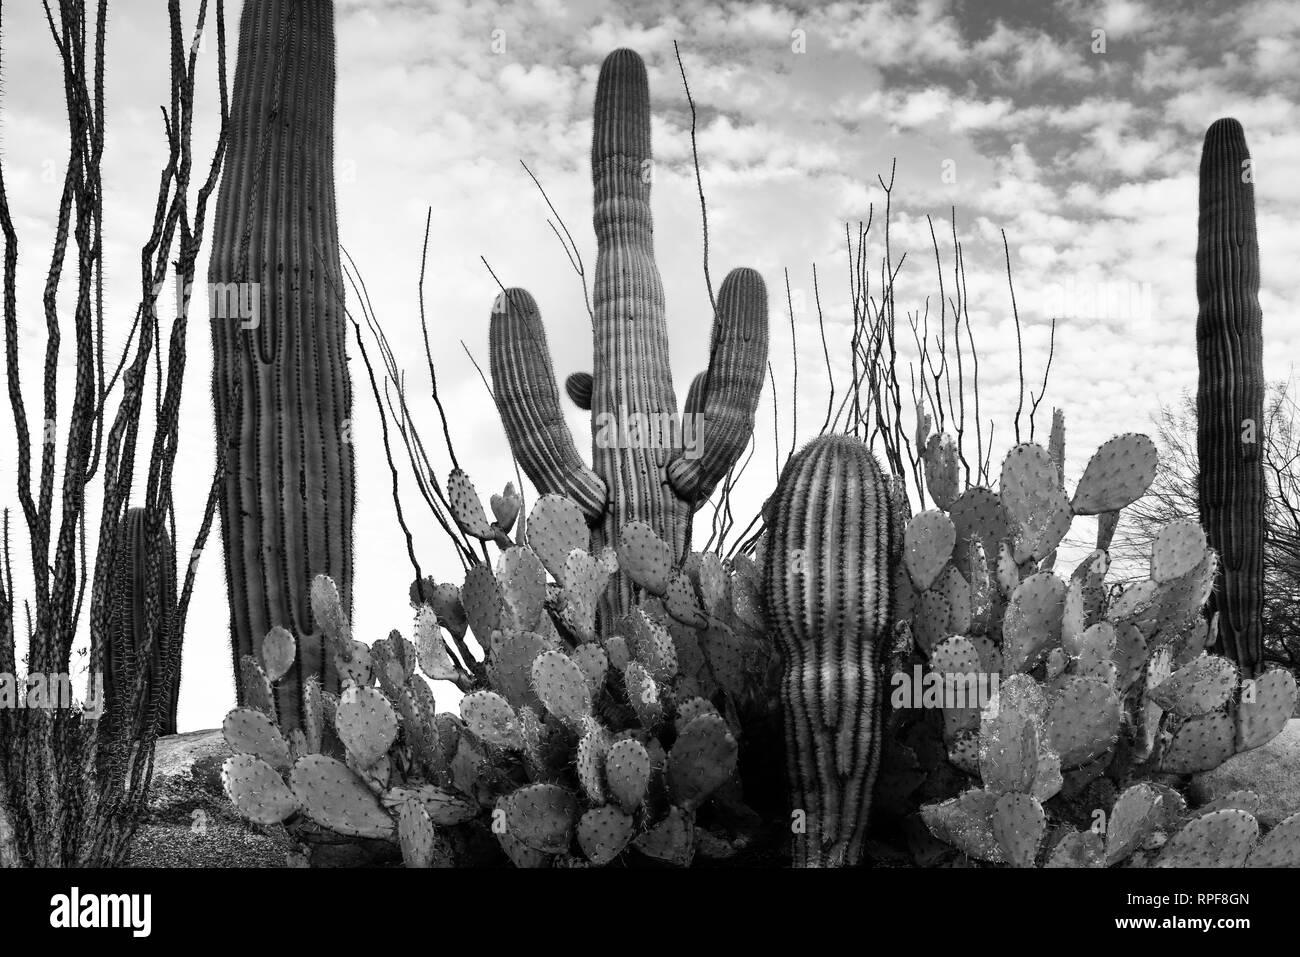 saguaro cactus black and